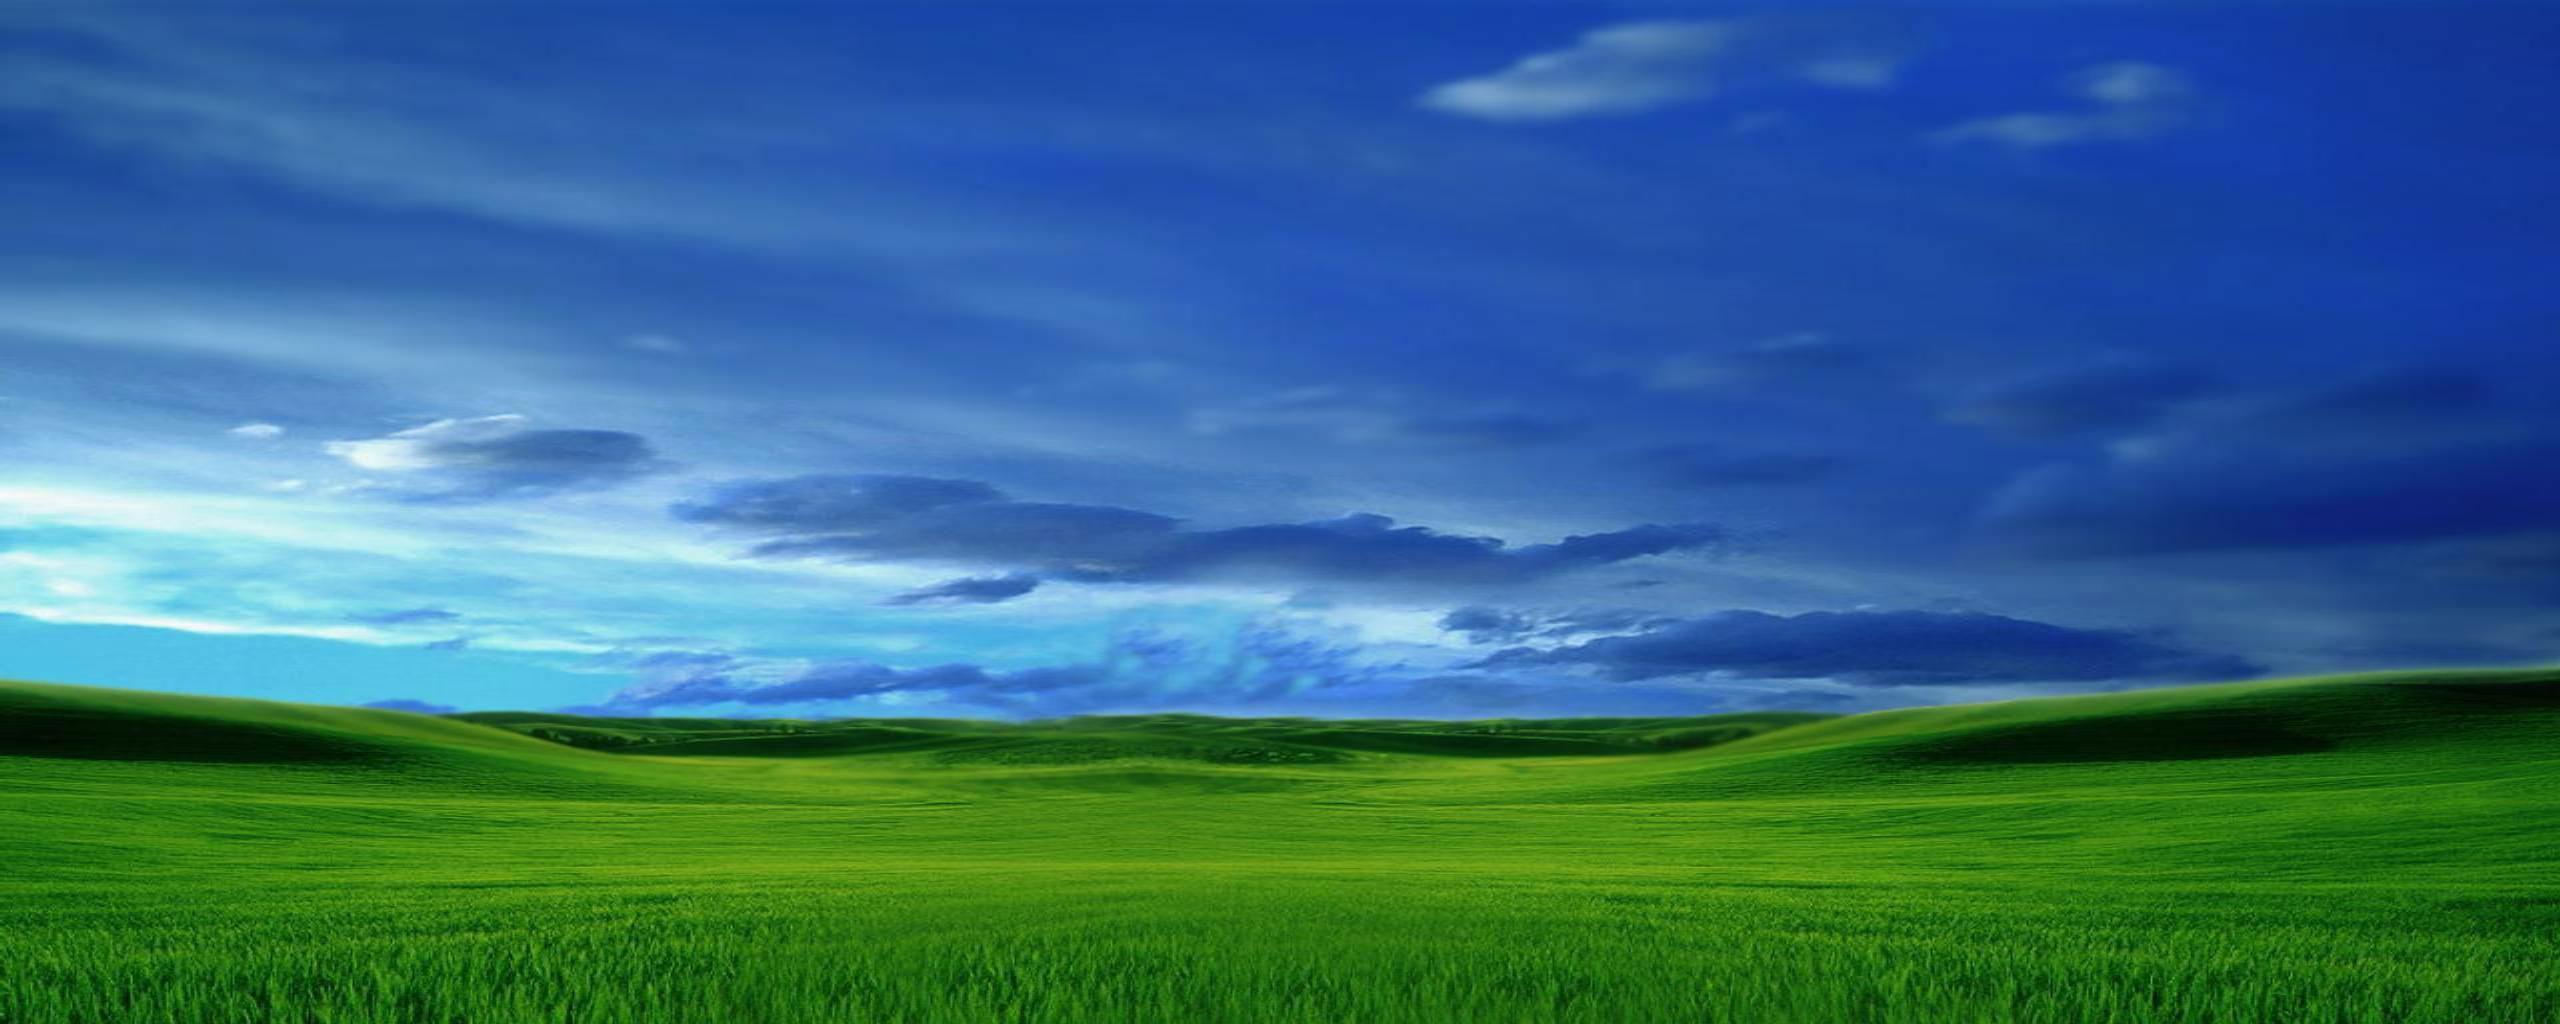 Microsoftデスクトップの背景 デュアル壁紙 2560x1024 Wallpapertip